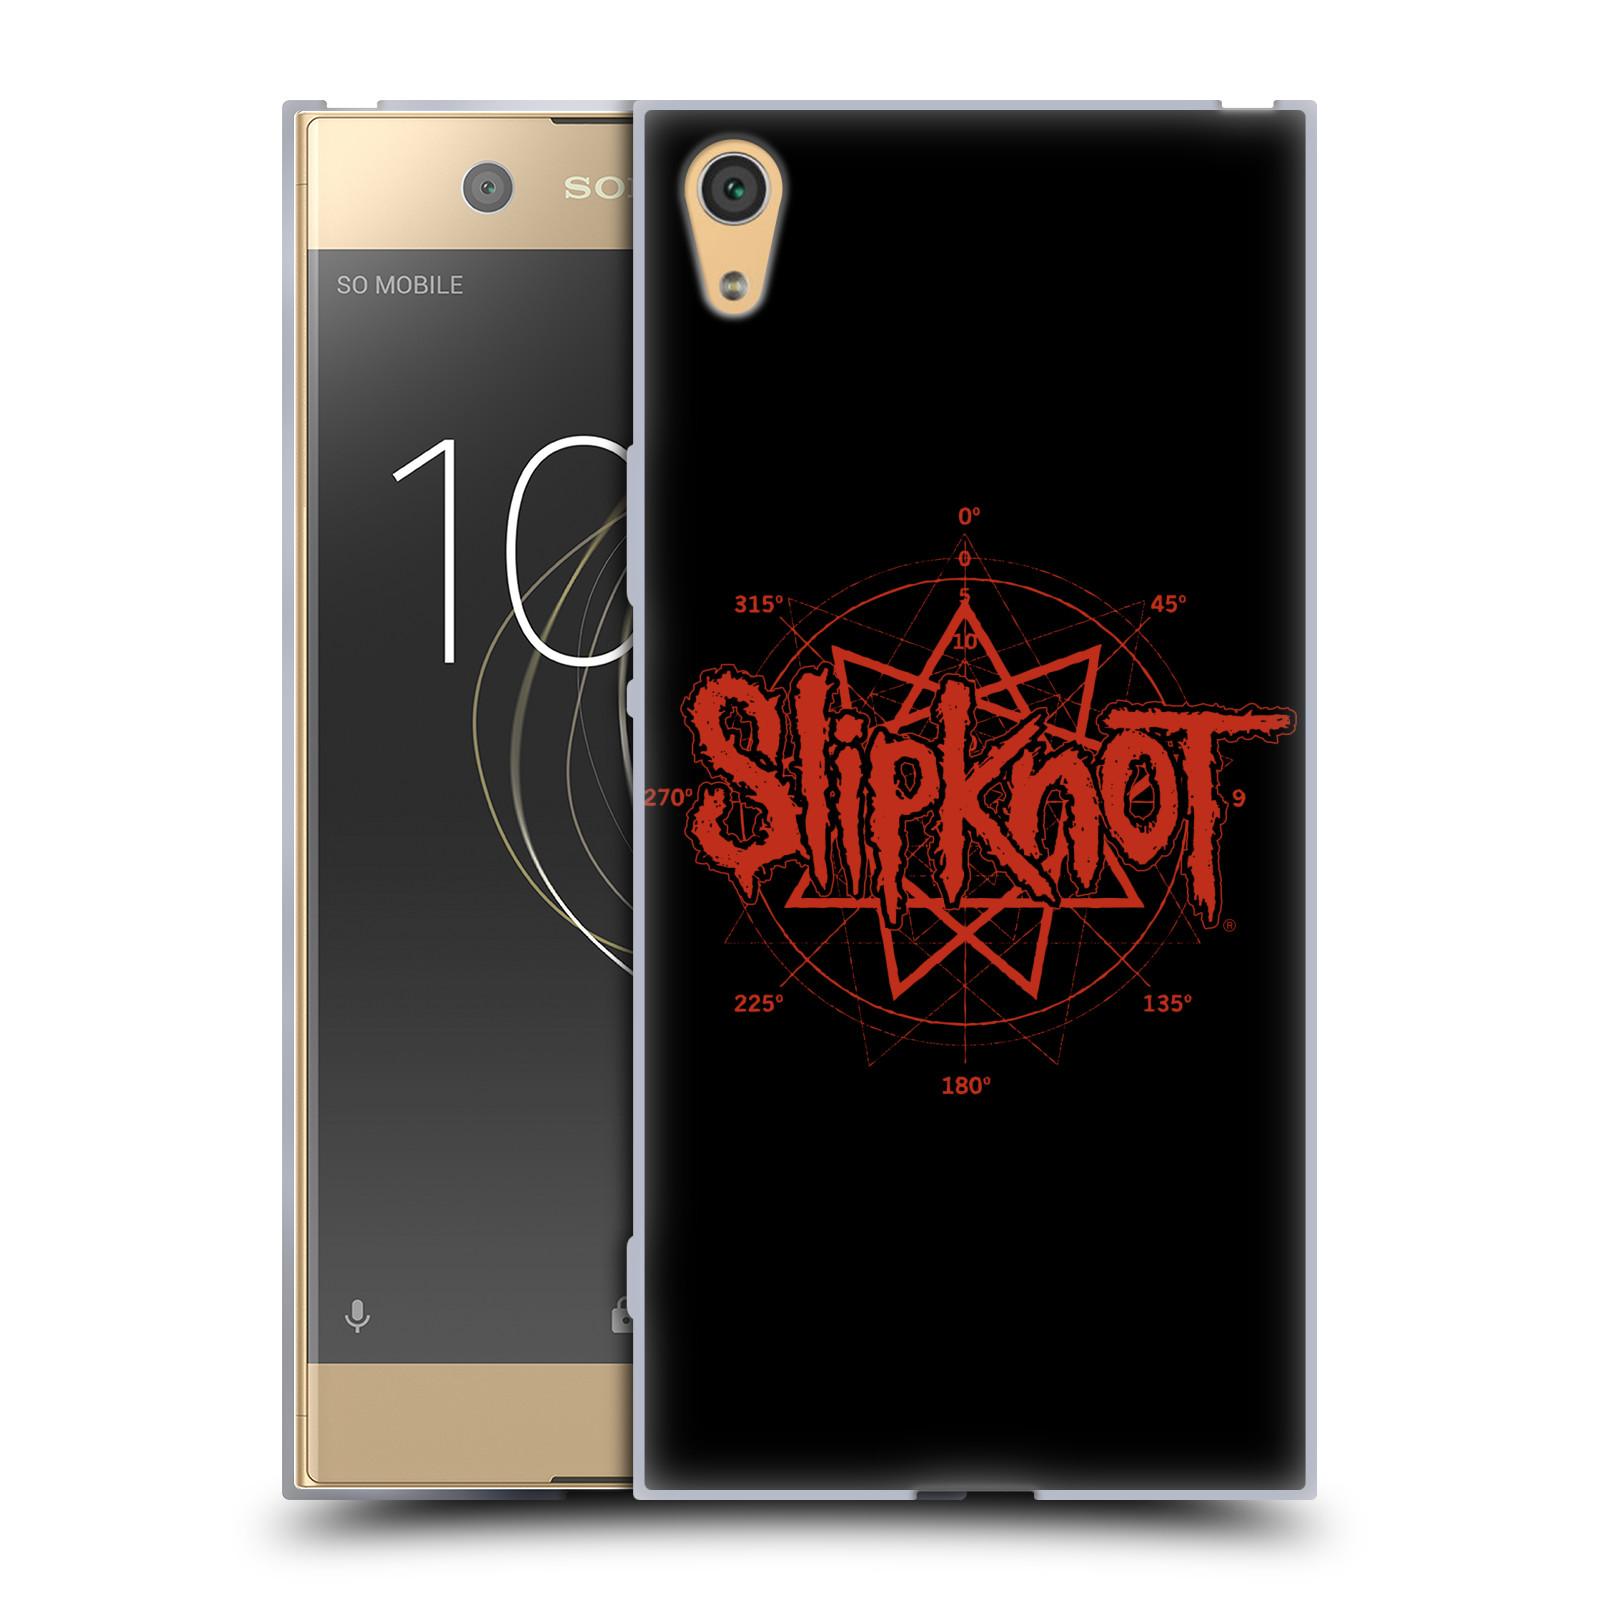 HEAD CASE silikonový obal na mobil Sony Xperia XA1 ULTRA hudební skupina Slipknot logo